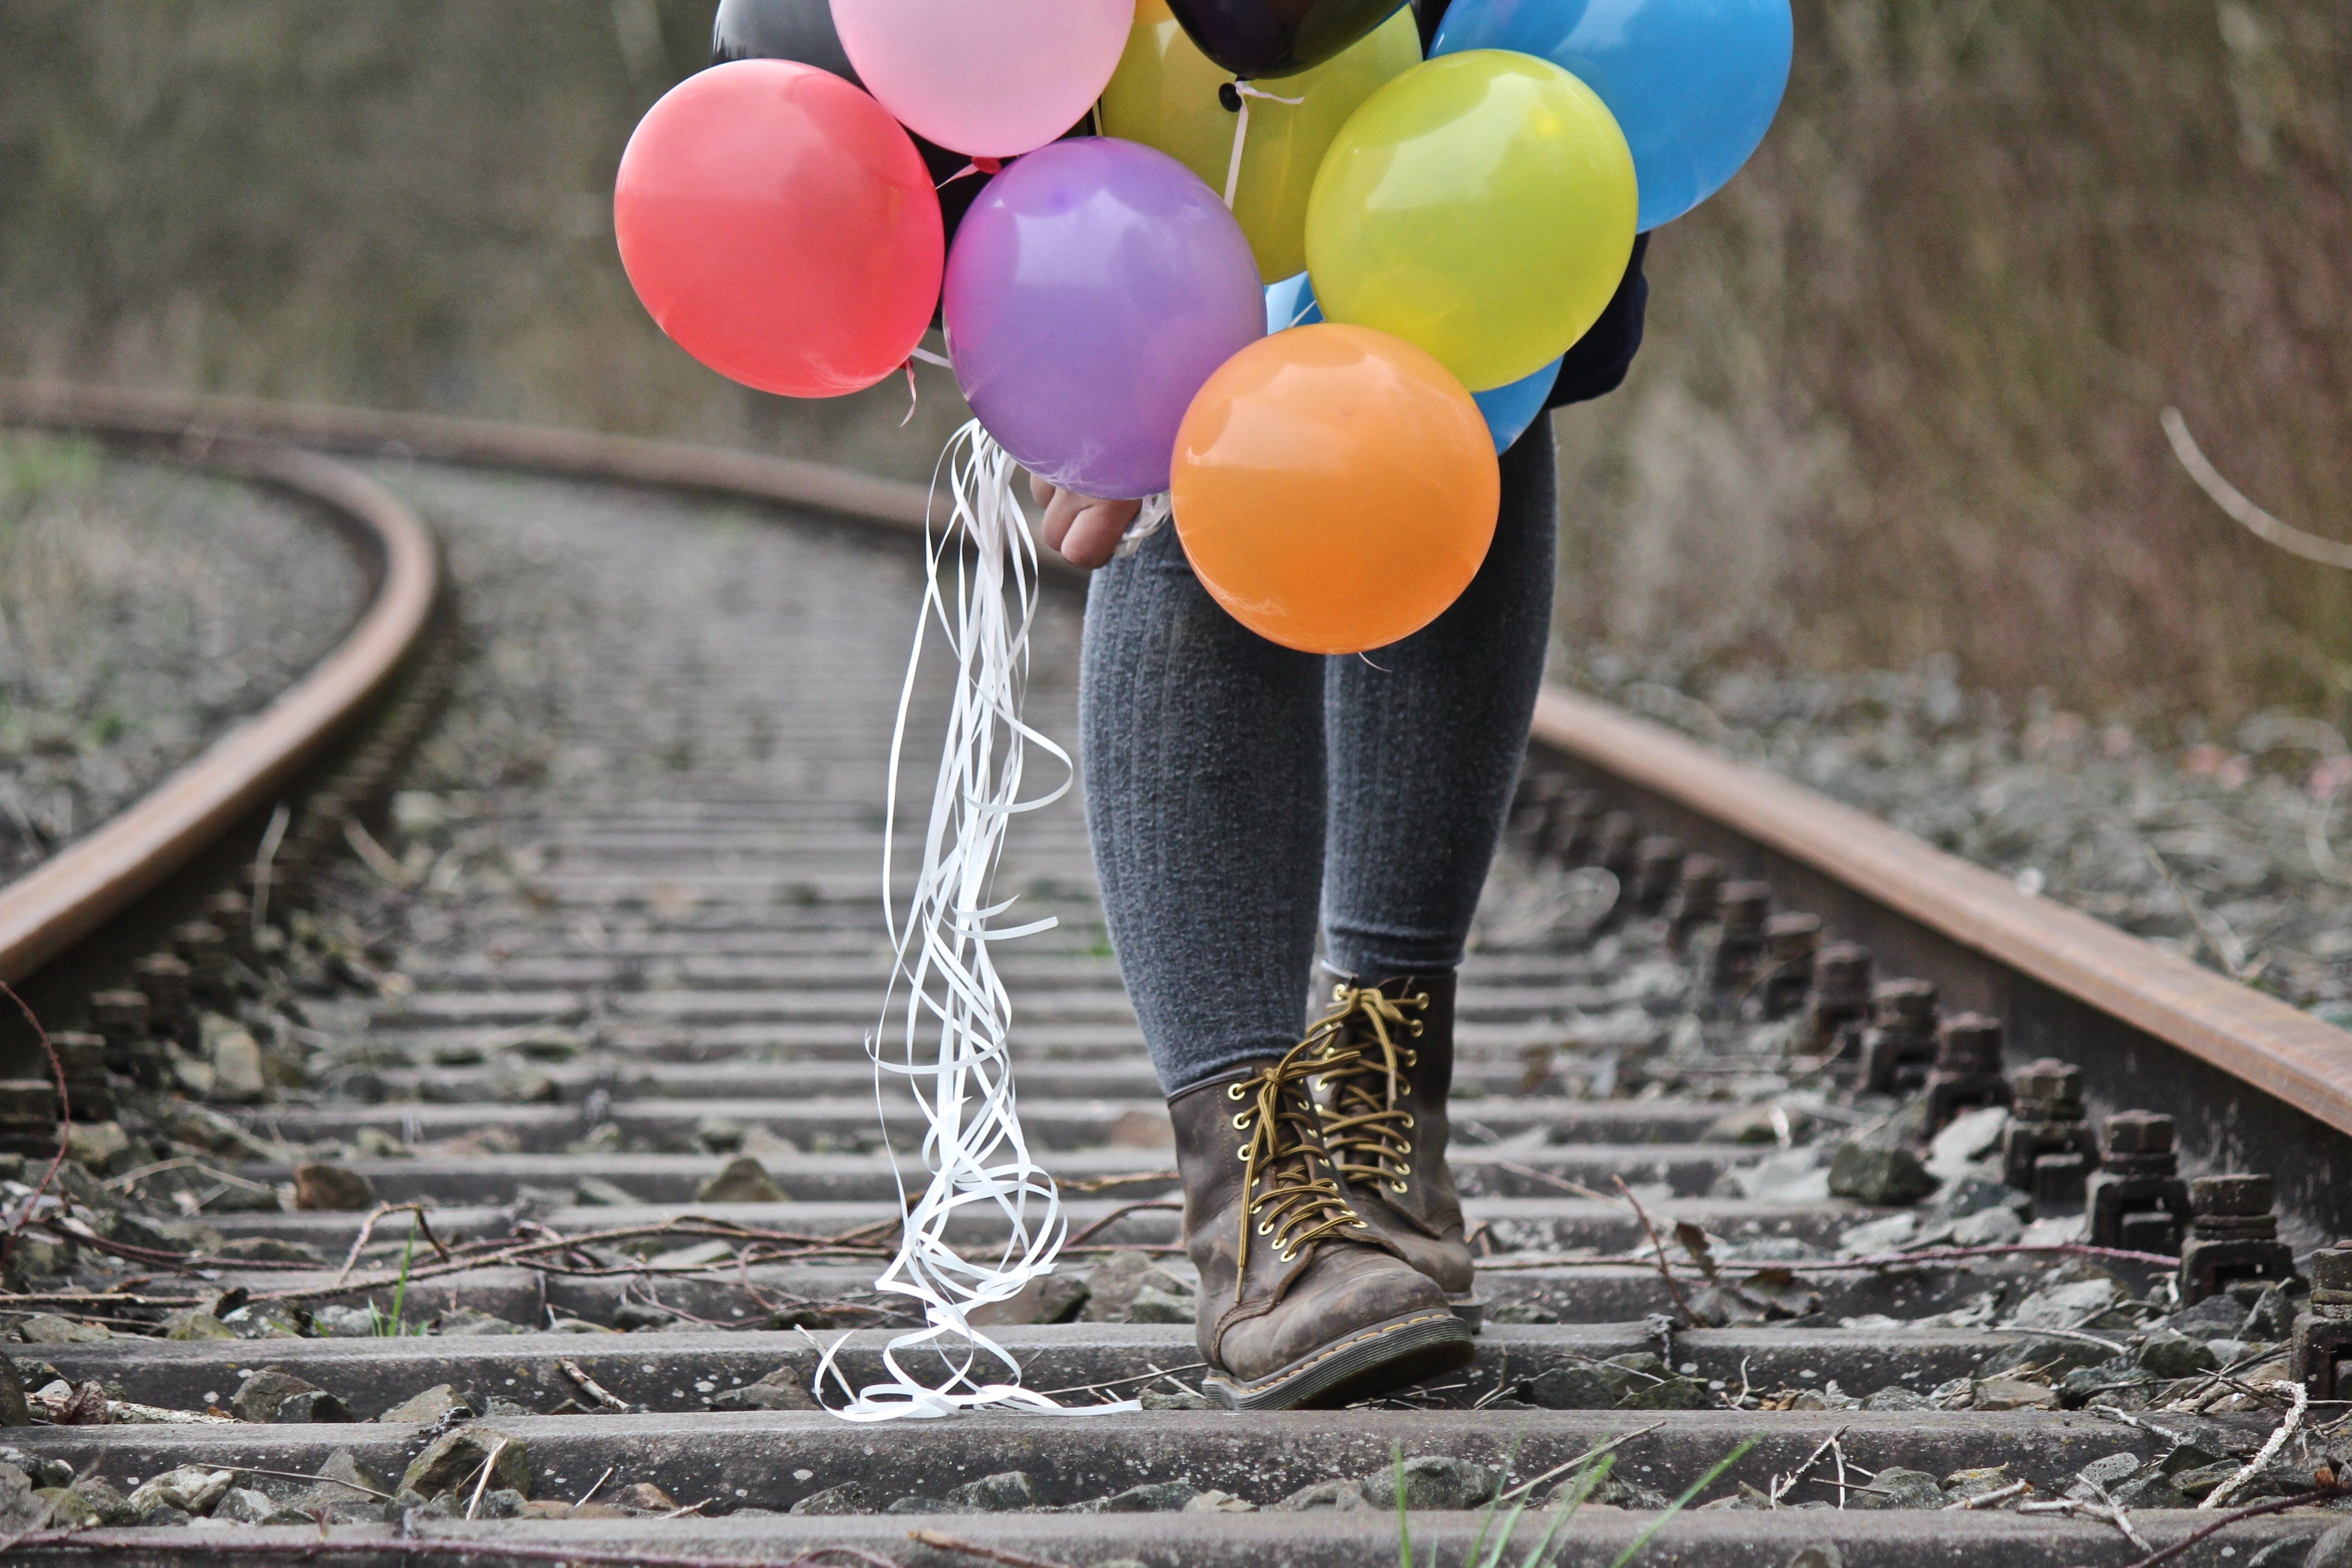 Kostenloses Stock Foto zu ballons, bunt, eisenbahn, schuhe